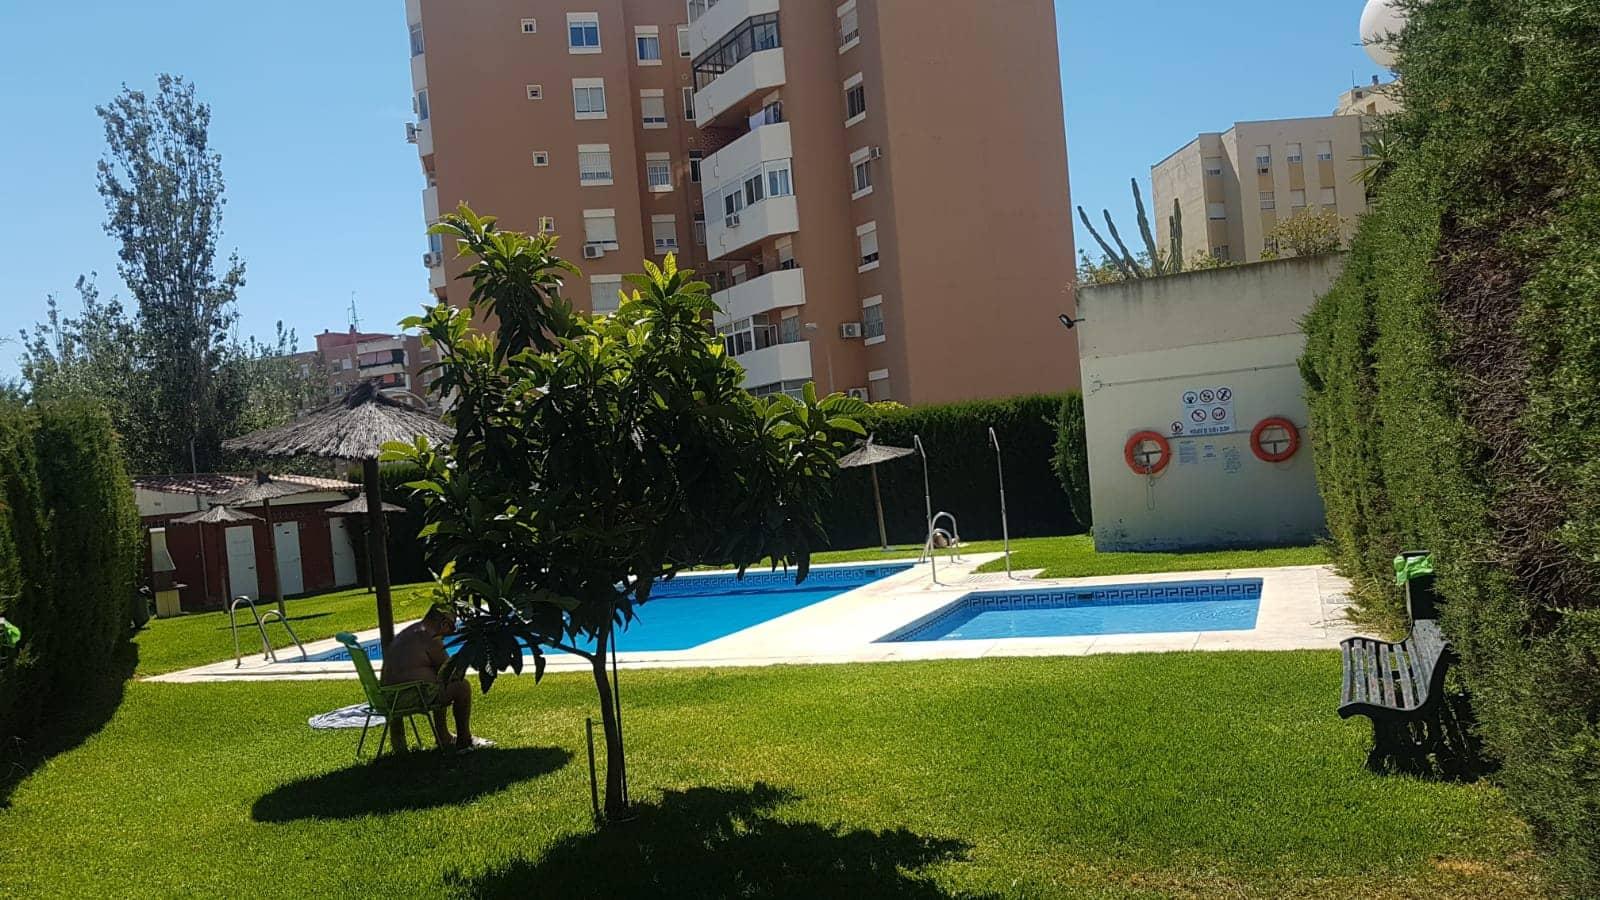 3 bedroom Apartment for sale in Torremolinos with pool garage - € 173,250 (Ref: 4676328)